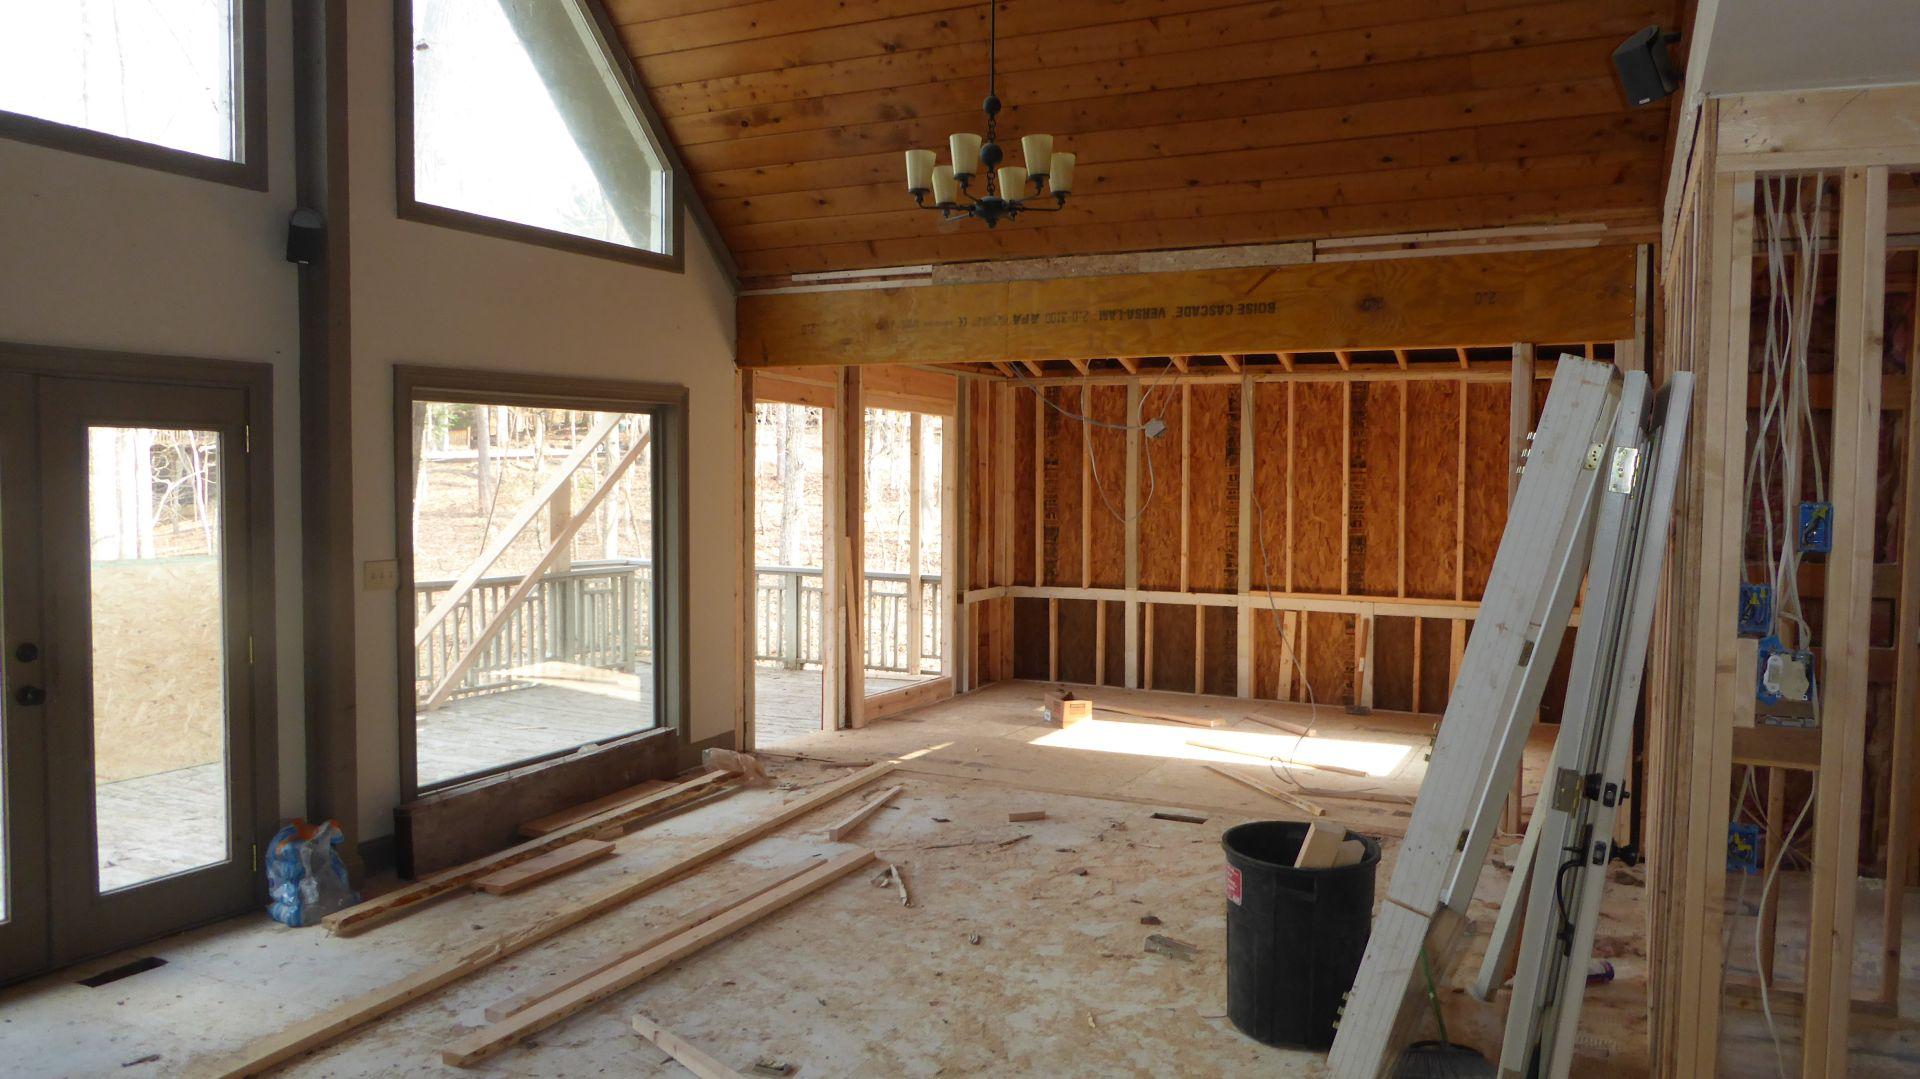 The Home Renovation Process Part 2